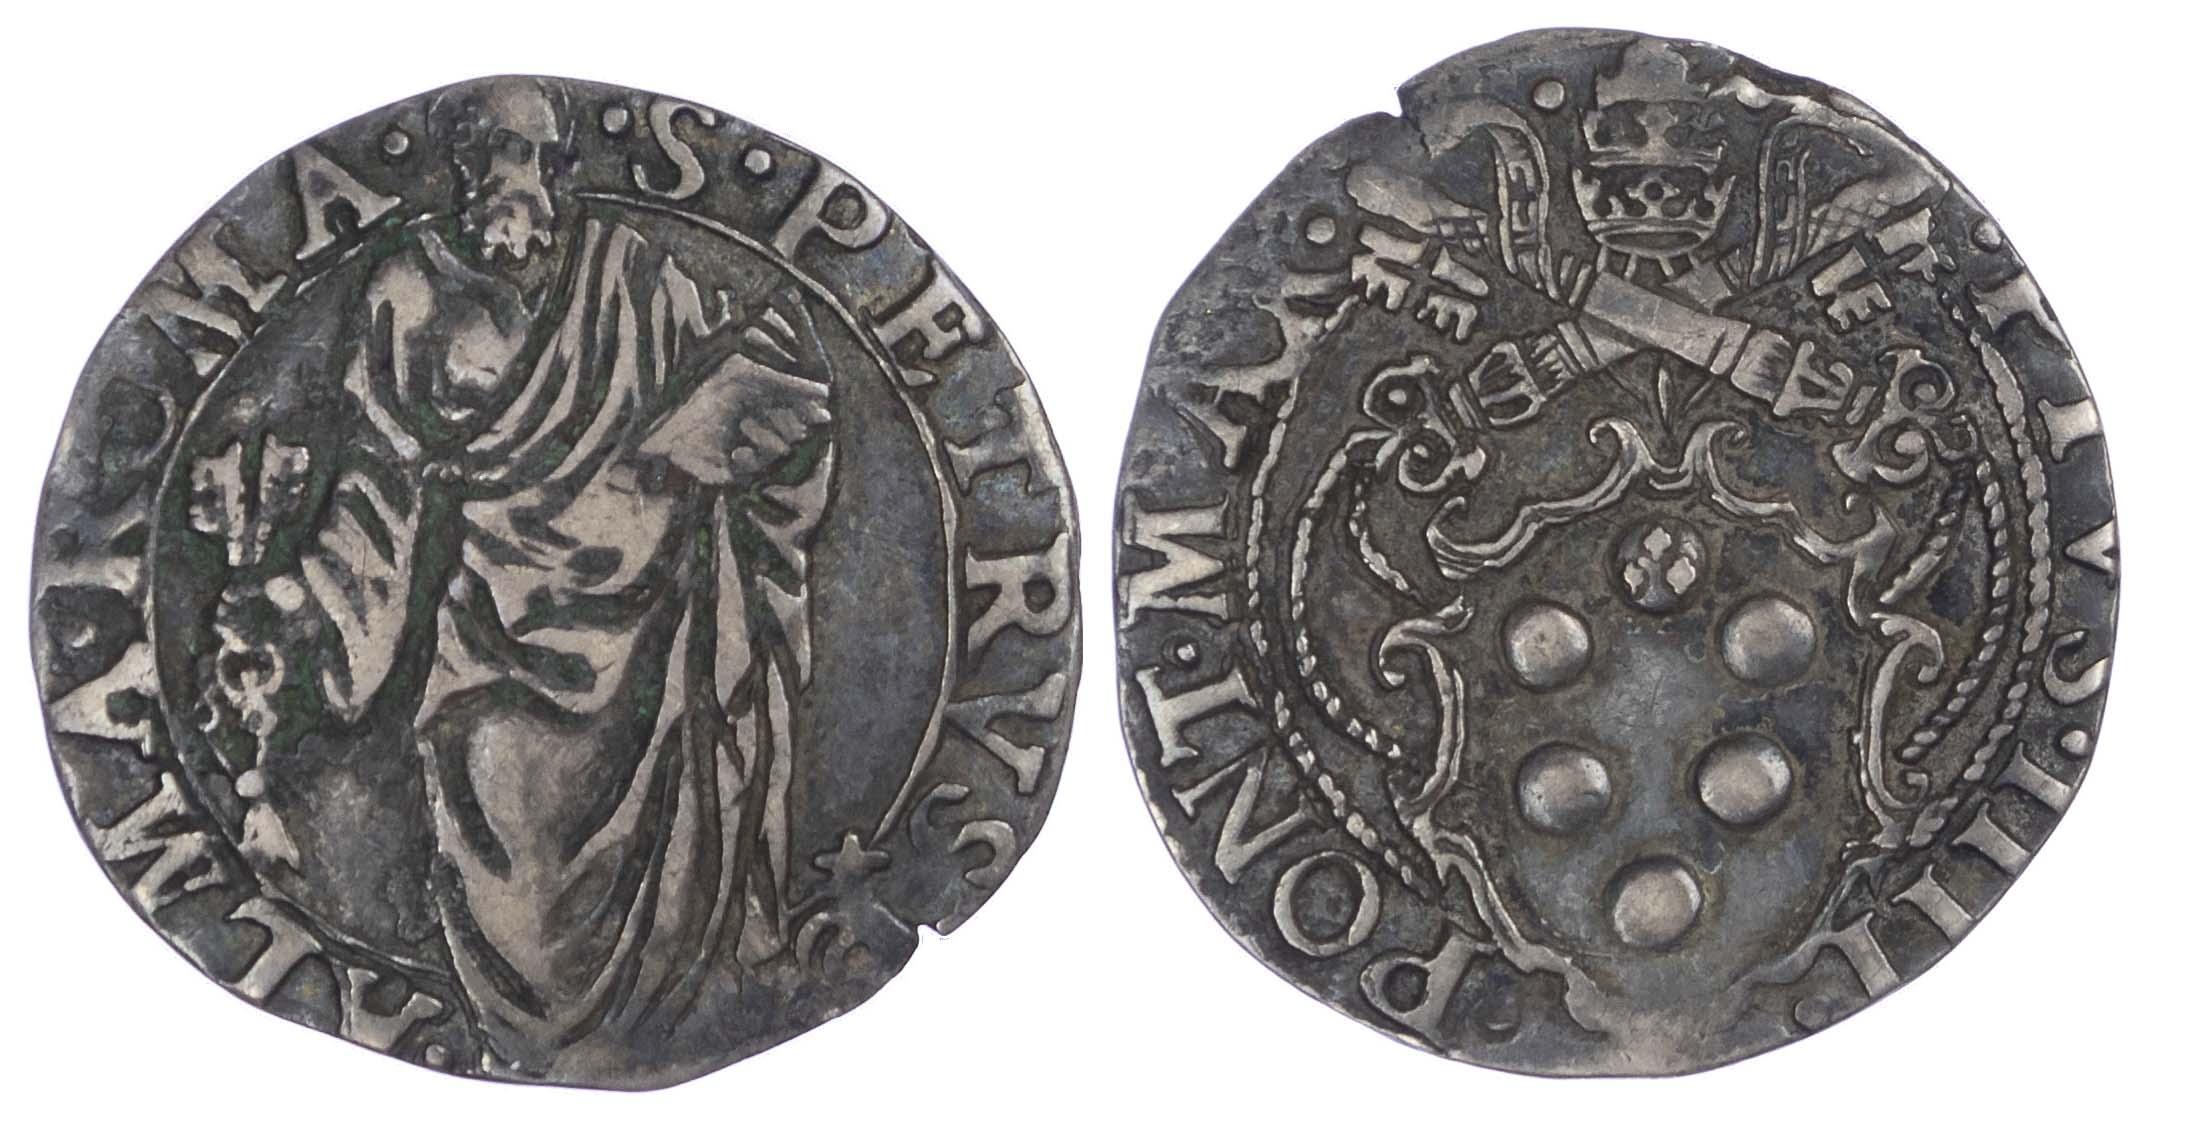 Italy, Papal States, Pio IV (1559-1565), silver Giulio